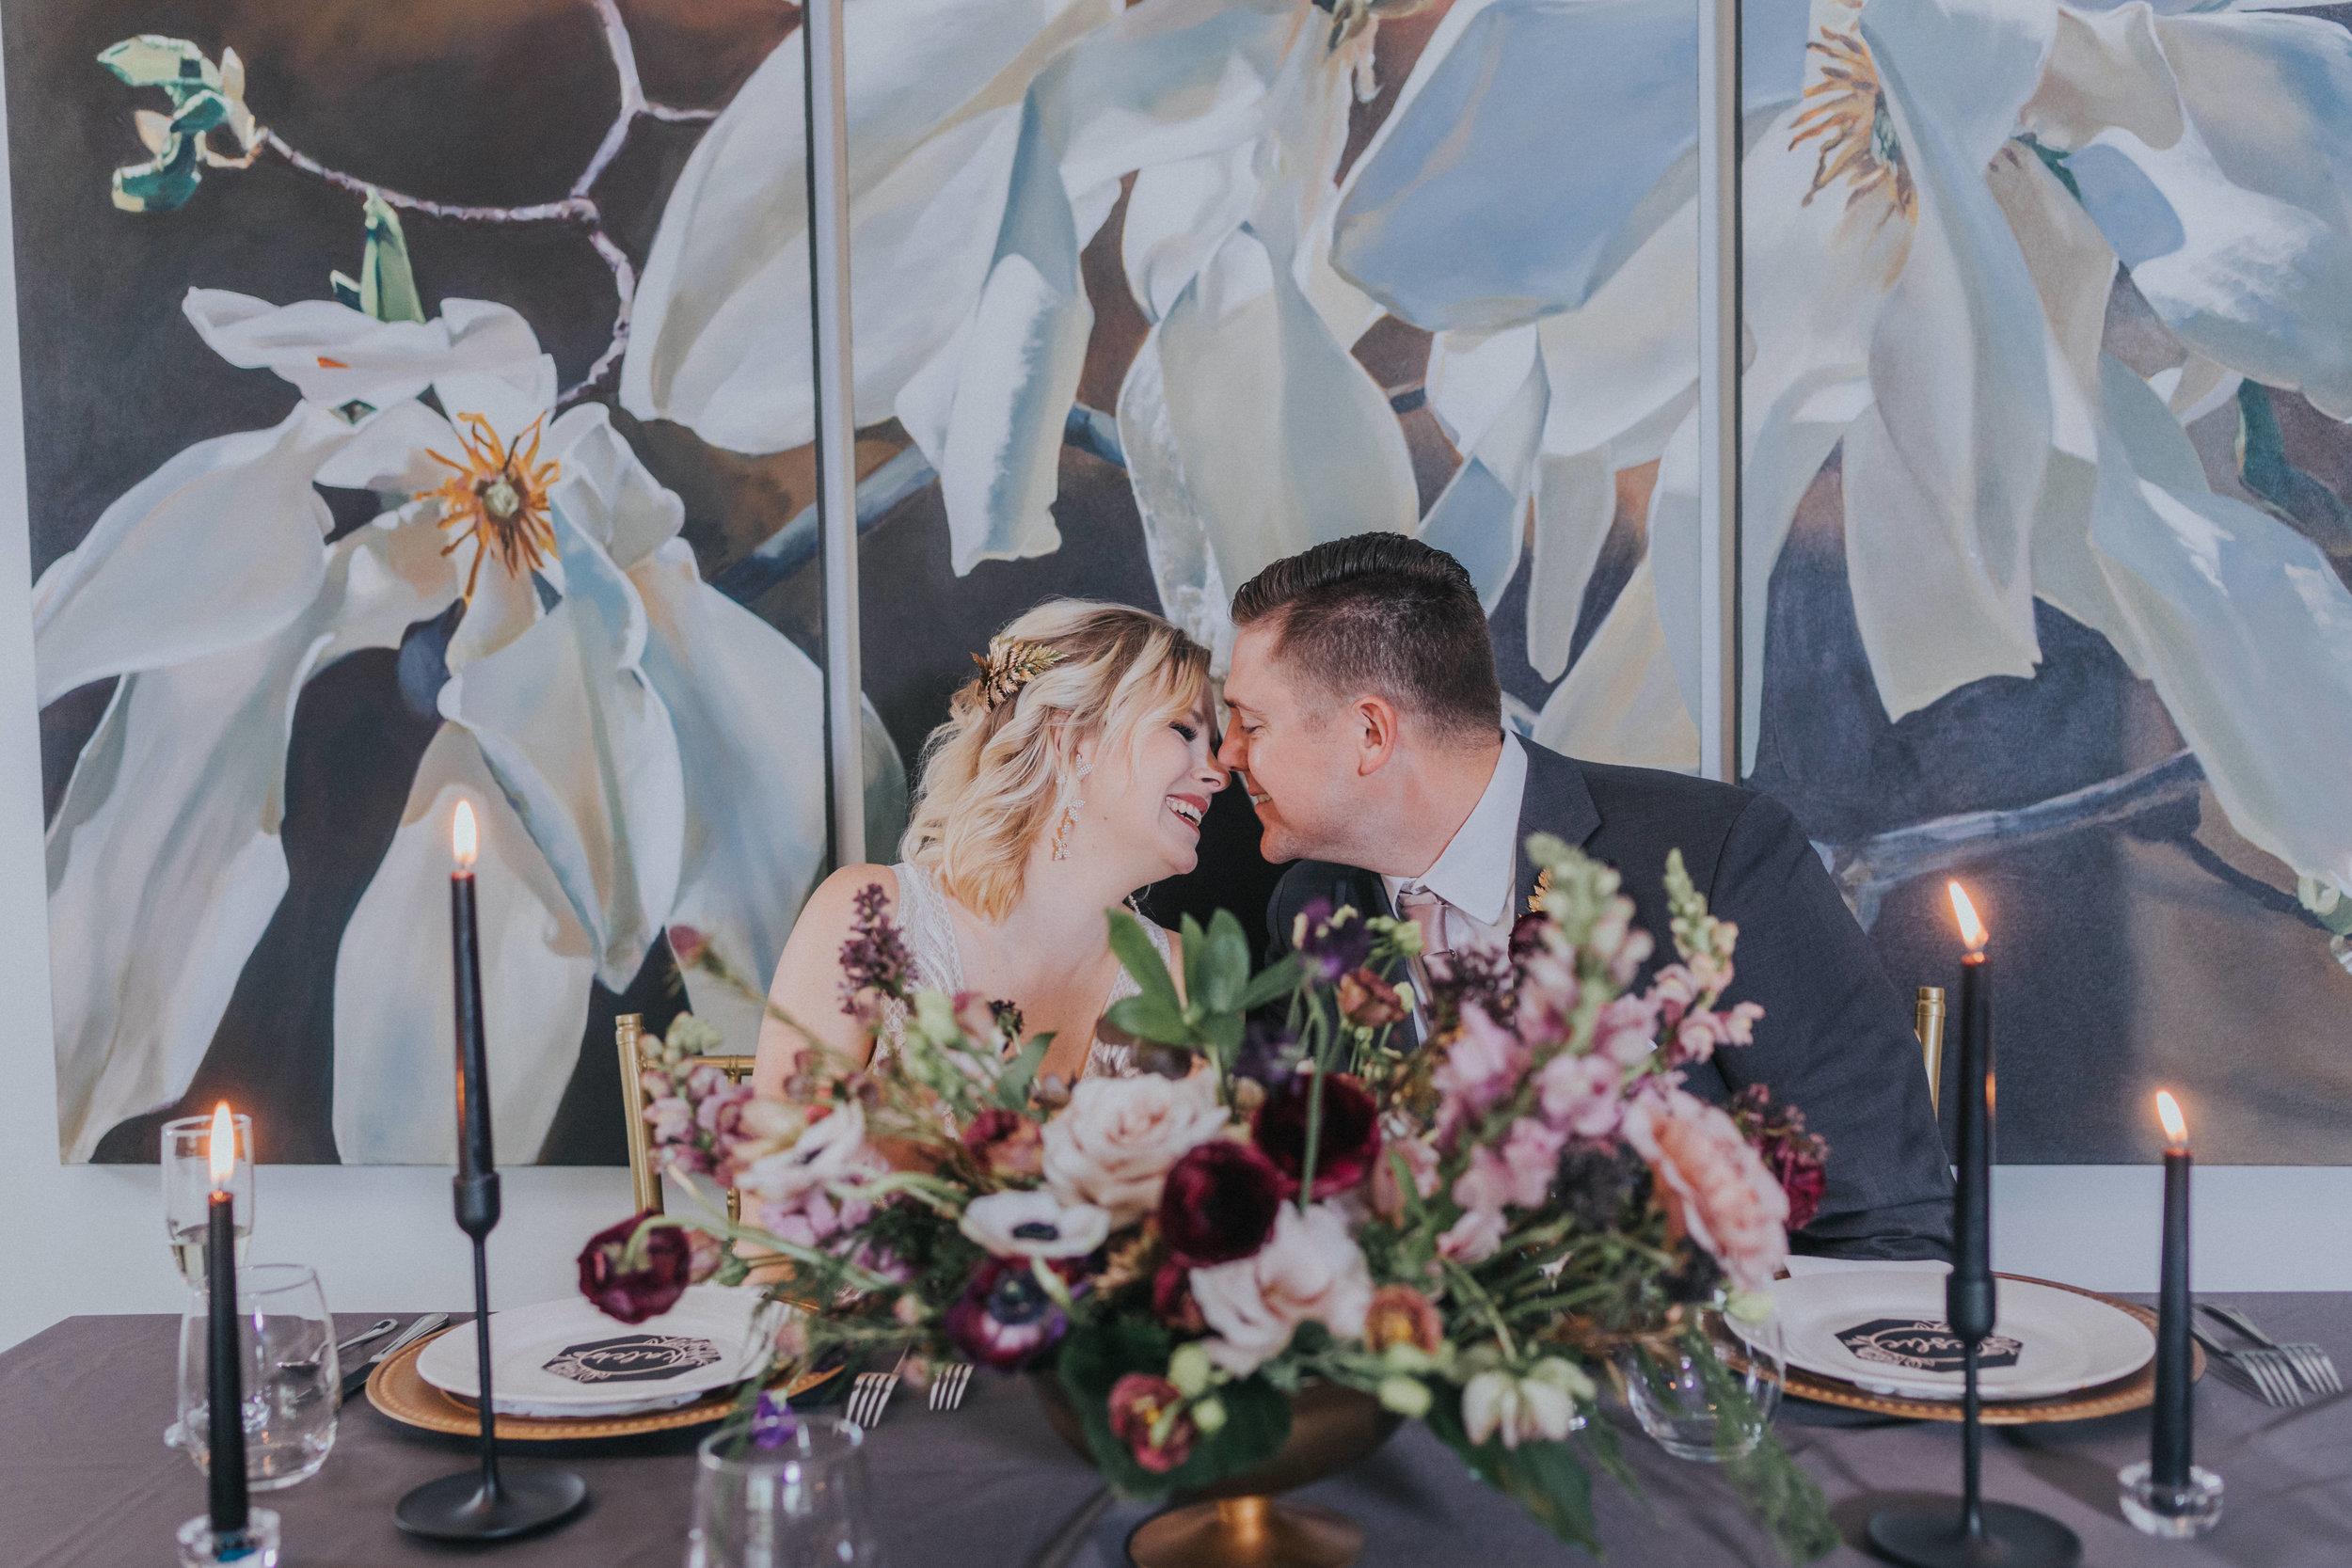 151 tiny-luxe-weddings-omaha-nebraska-midwest-empire-room.jpg